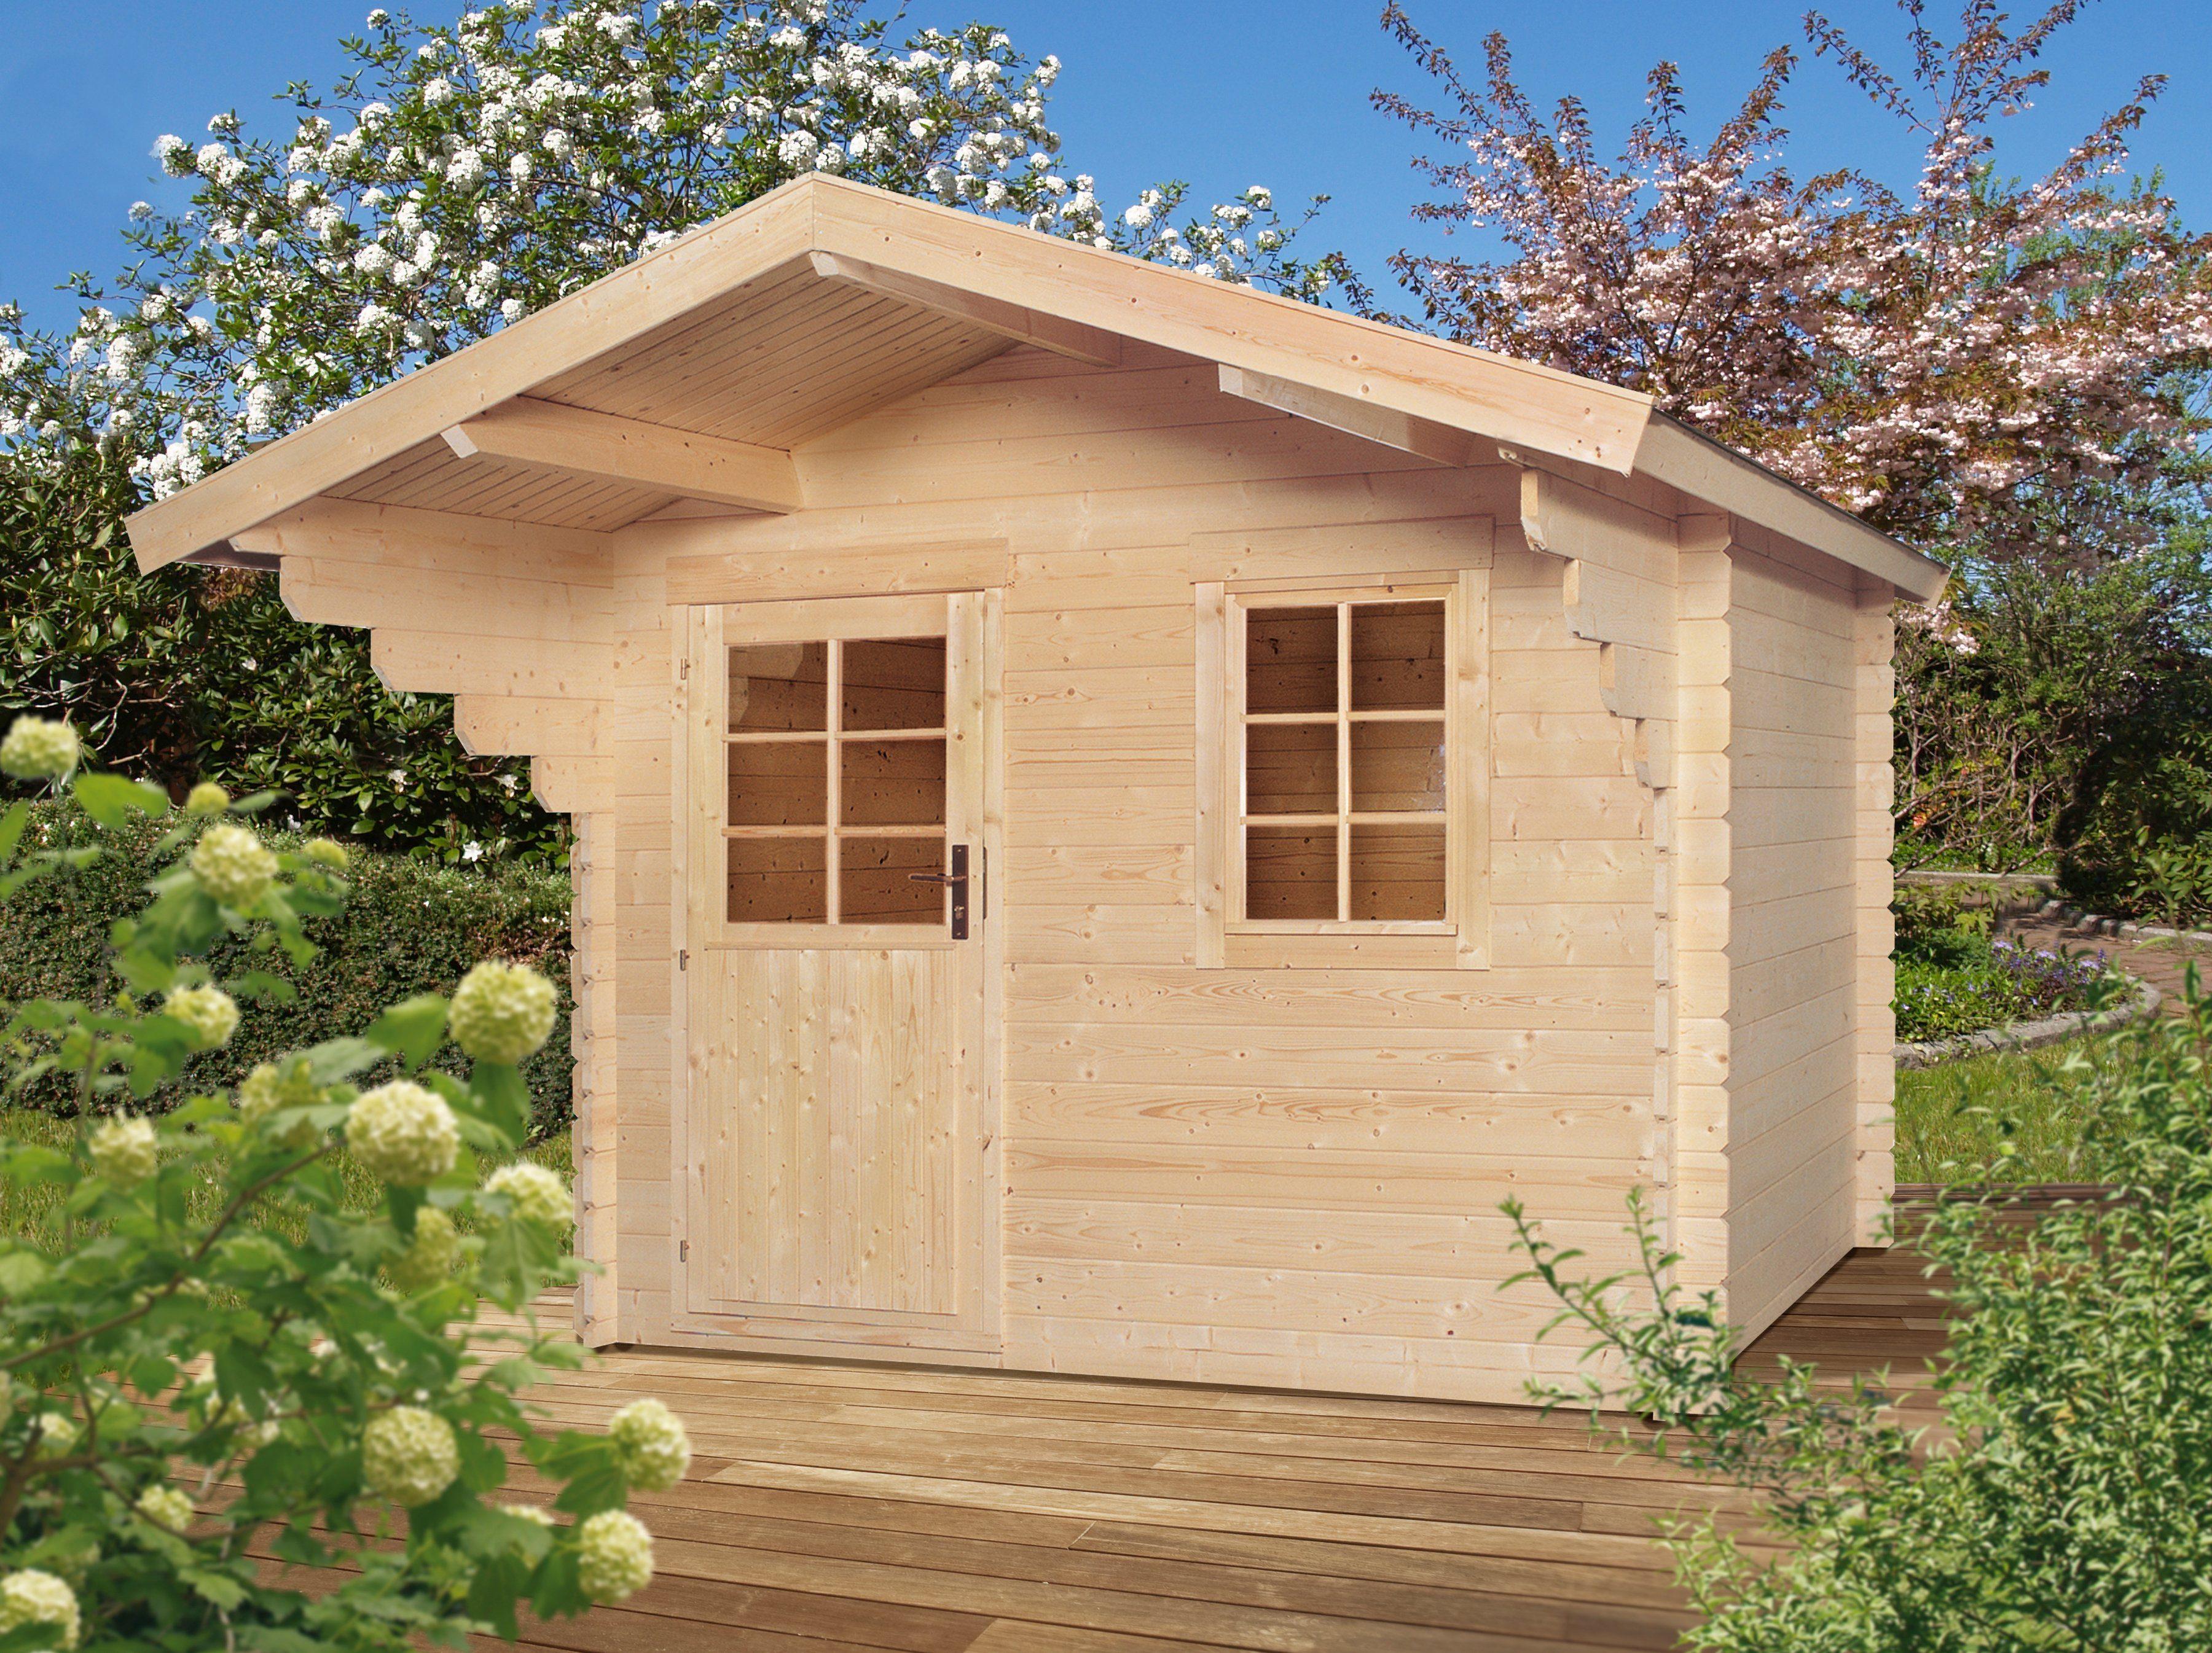 Fußboden Für Gartenhaus ~ M² imprägnierte bretter profilholz holz fussboden gartenhaus in